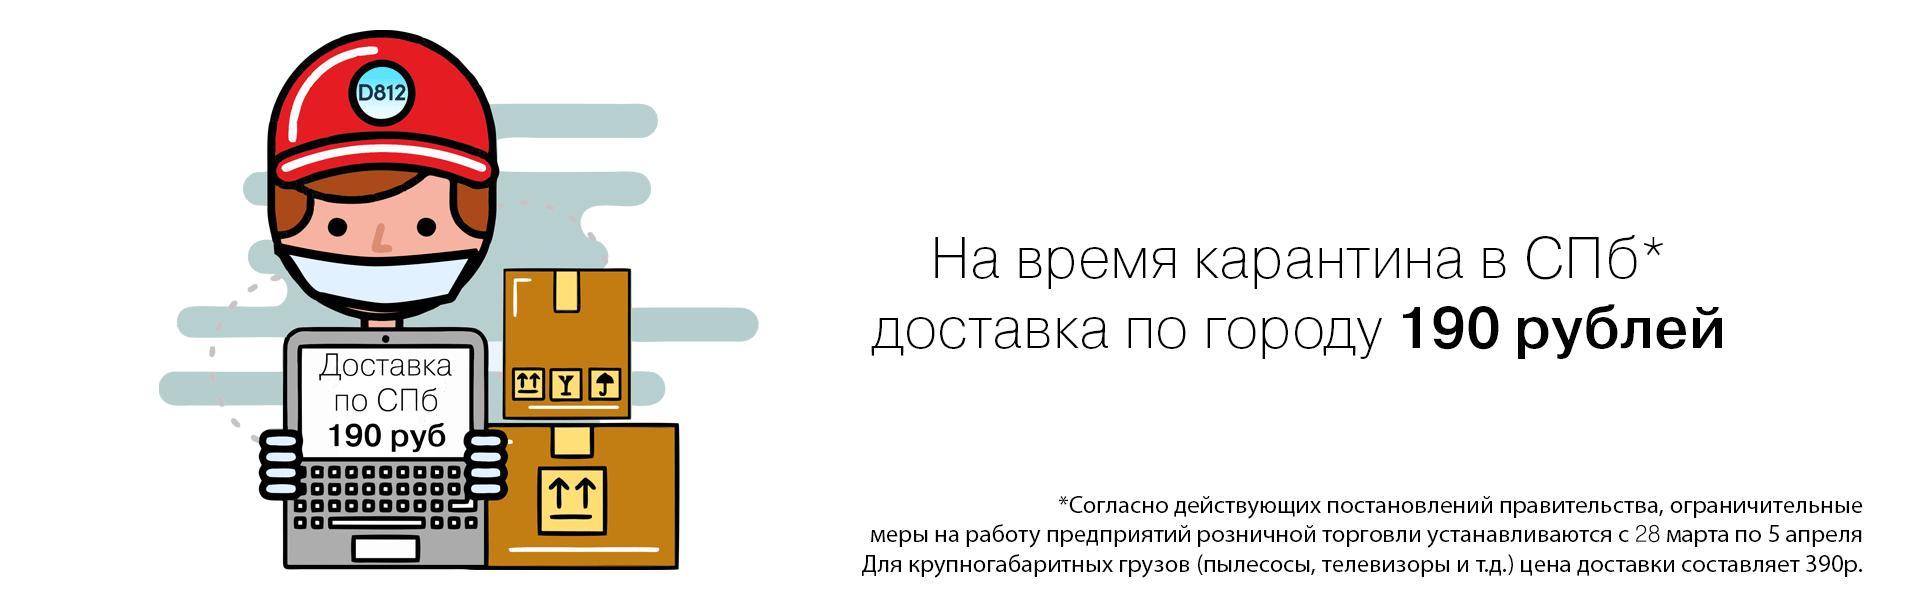 Доставка 190 рублей!